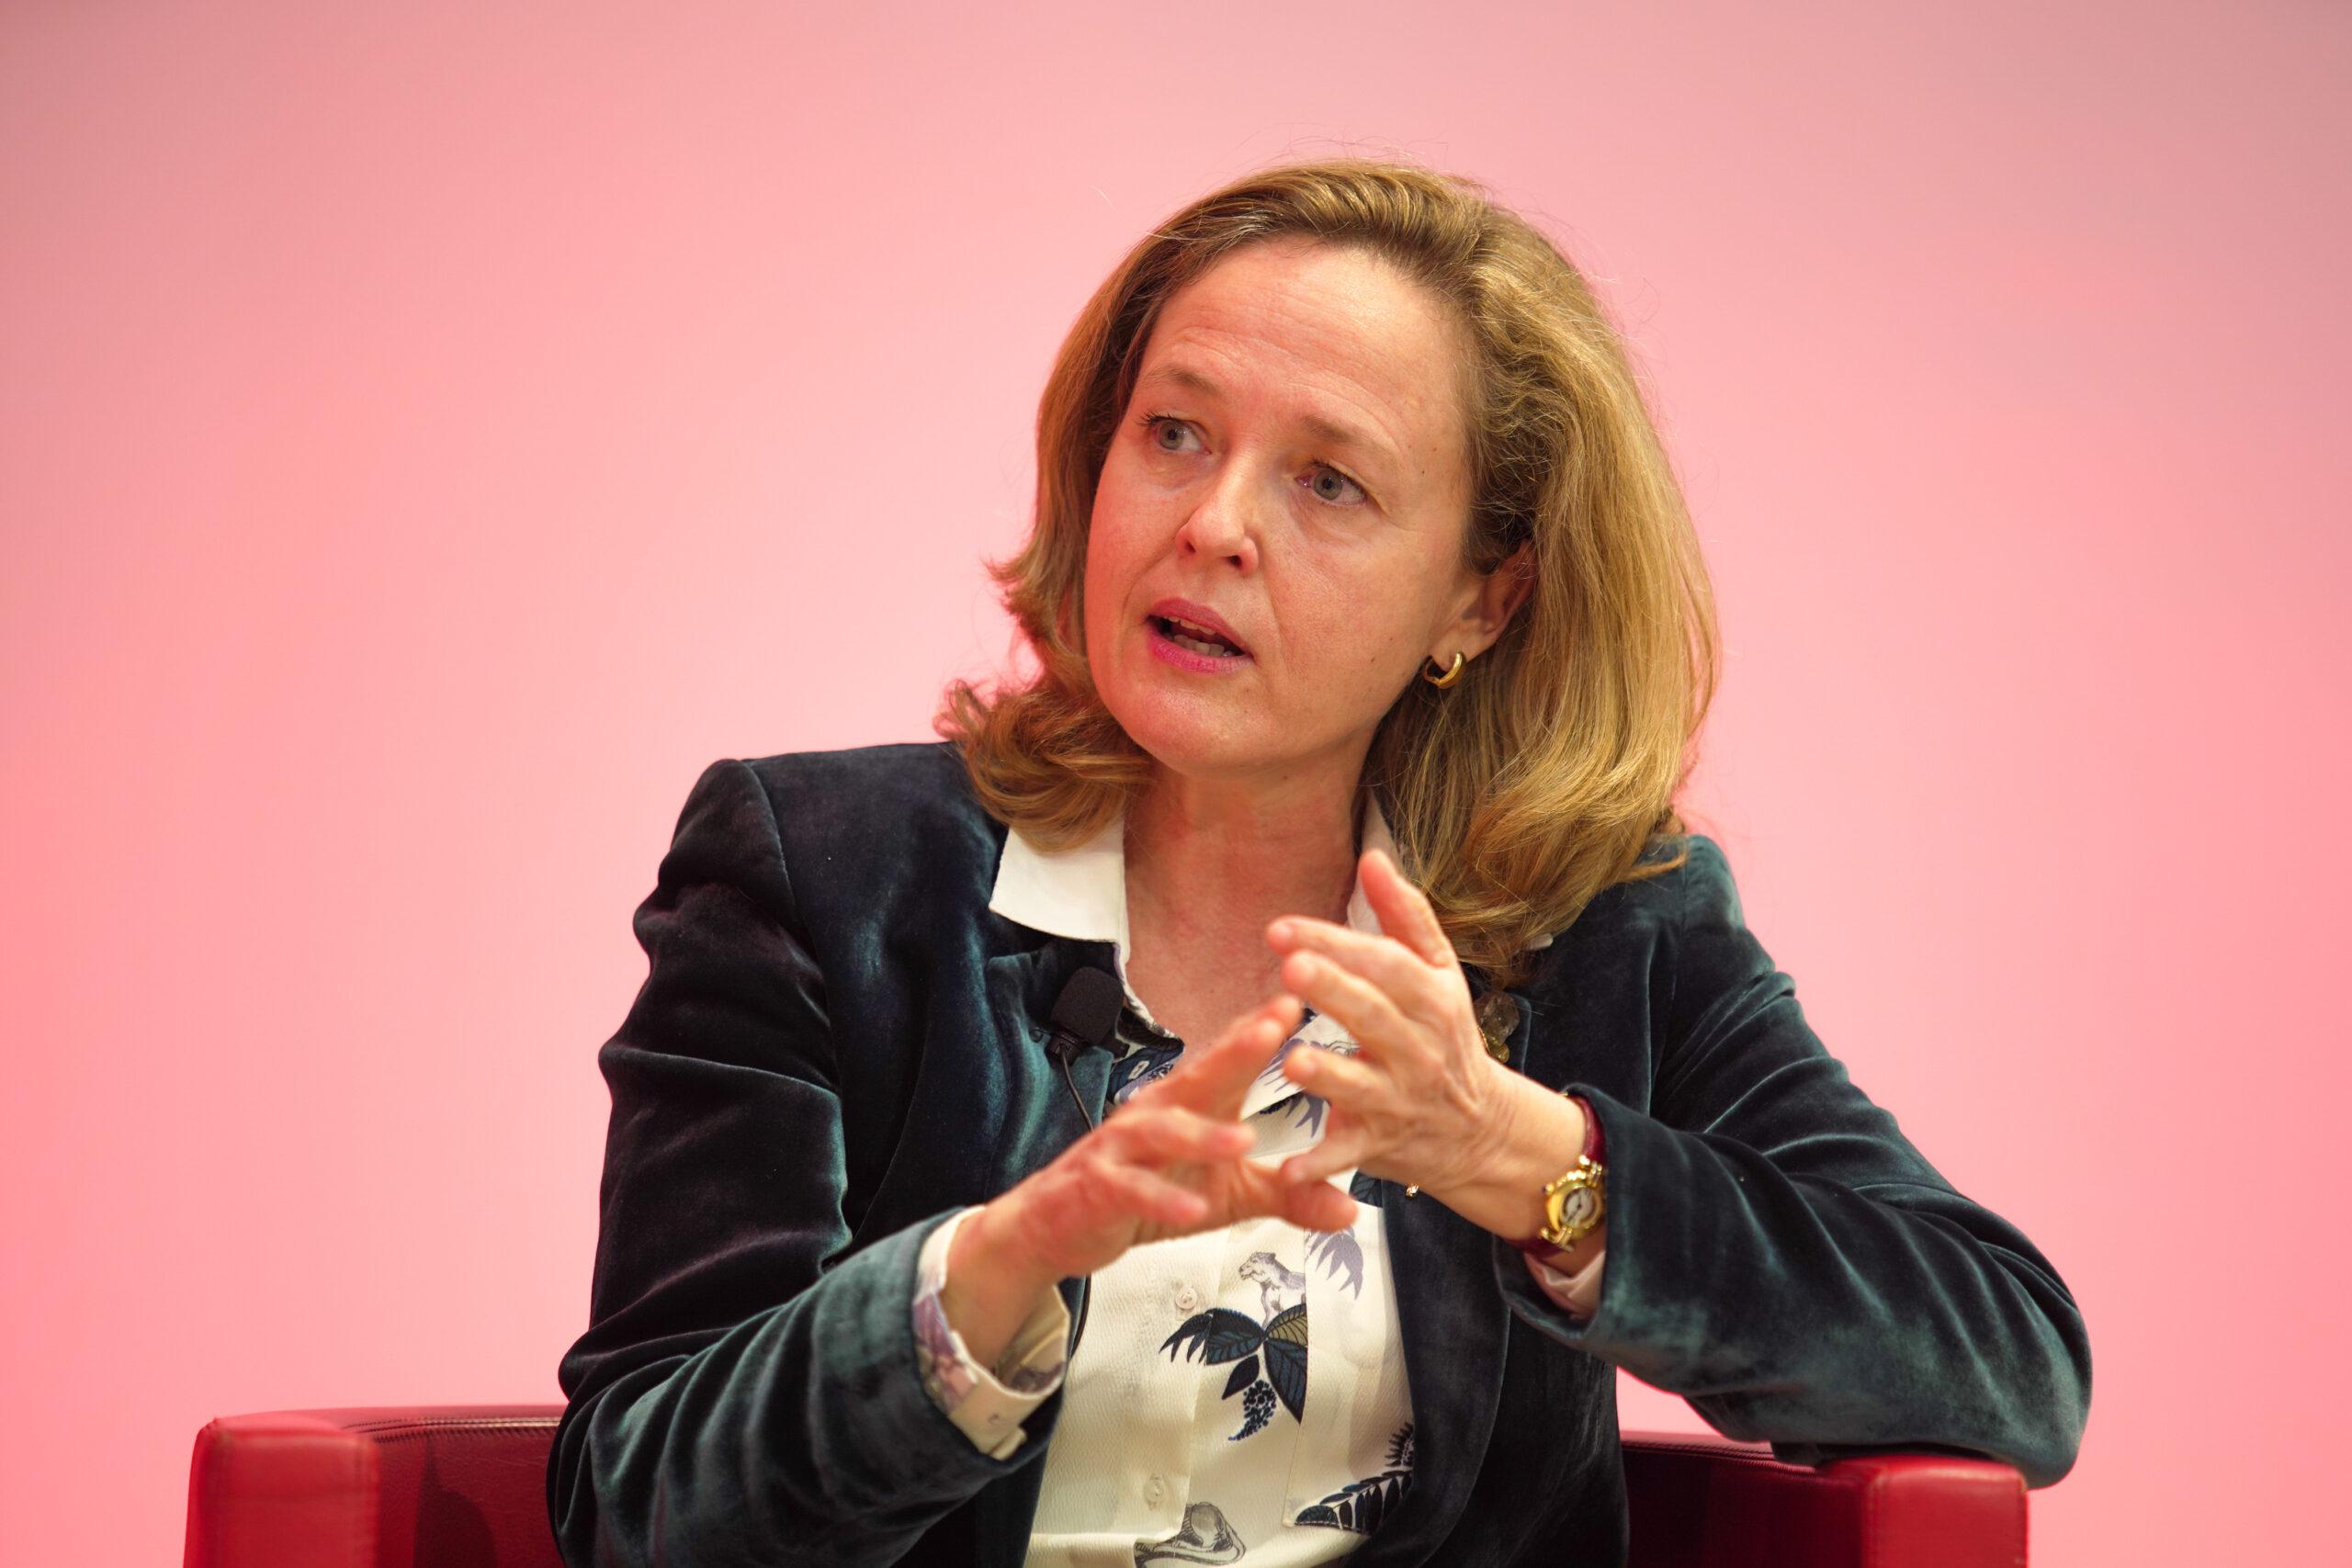 La vicepresidenta tercera i ministra d'Afers Econòmics, Nadia Calviño | ACN